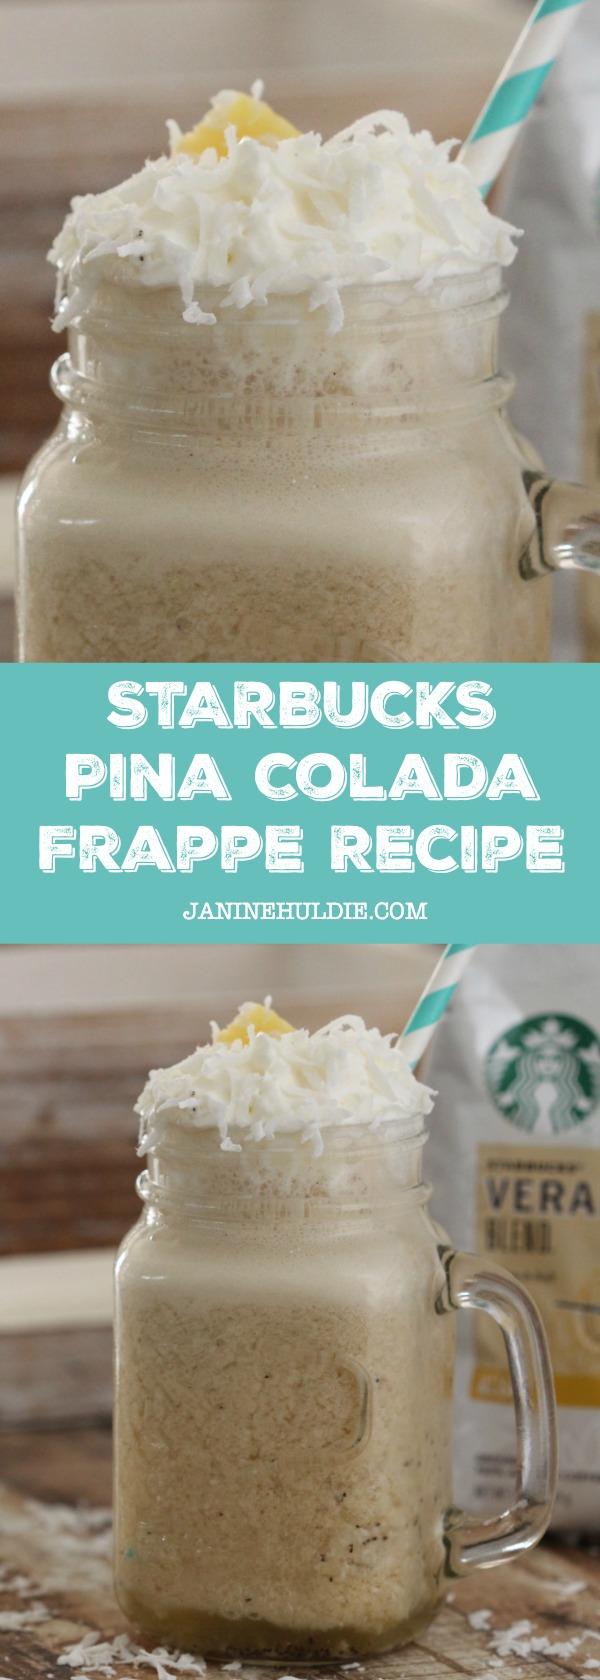 Starbucks Pina Colada Recipe